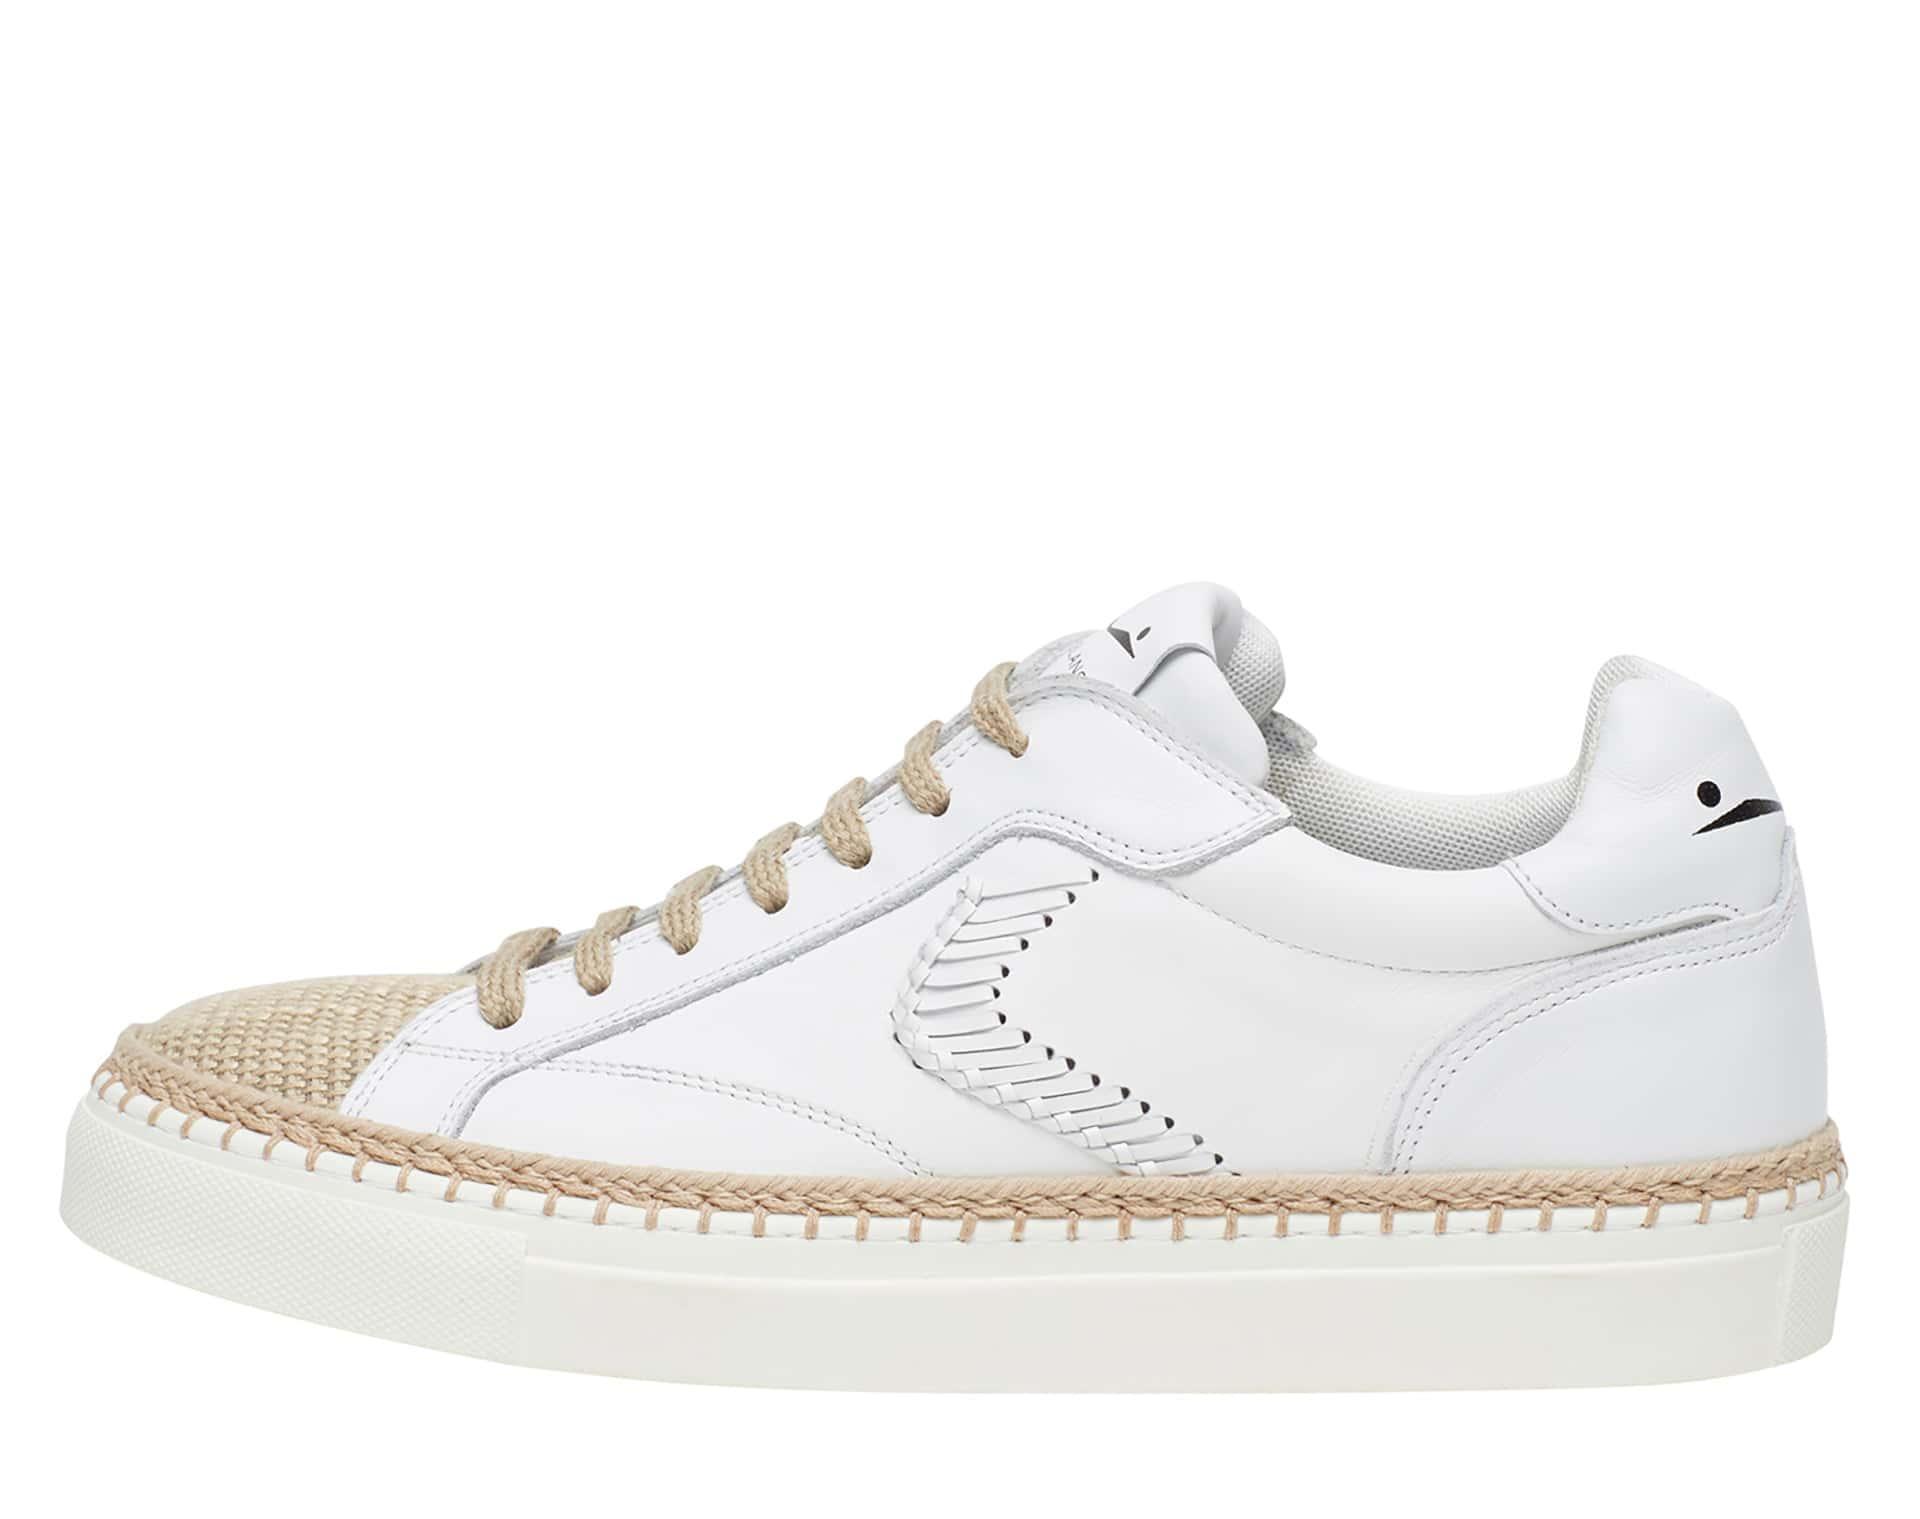 PORTOFINO BRAID - Leather and jute sneakers - White